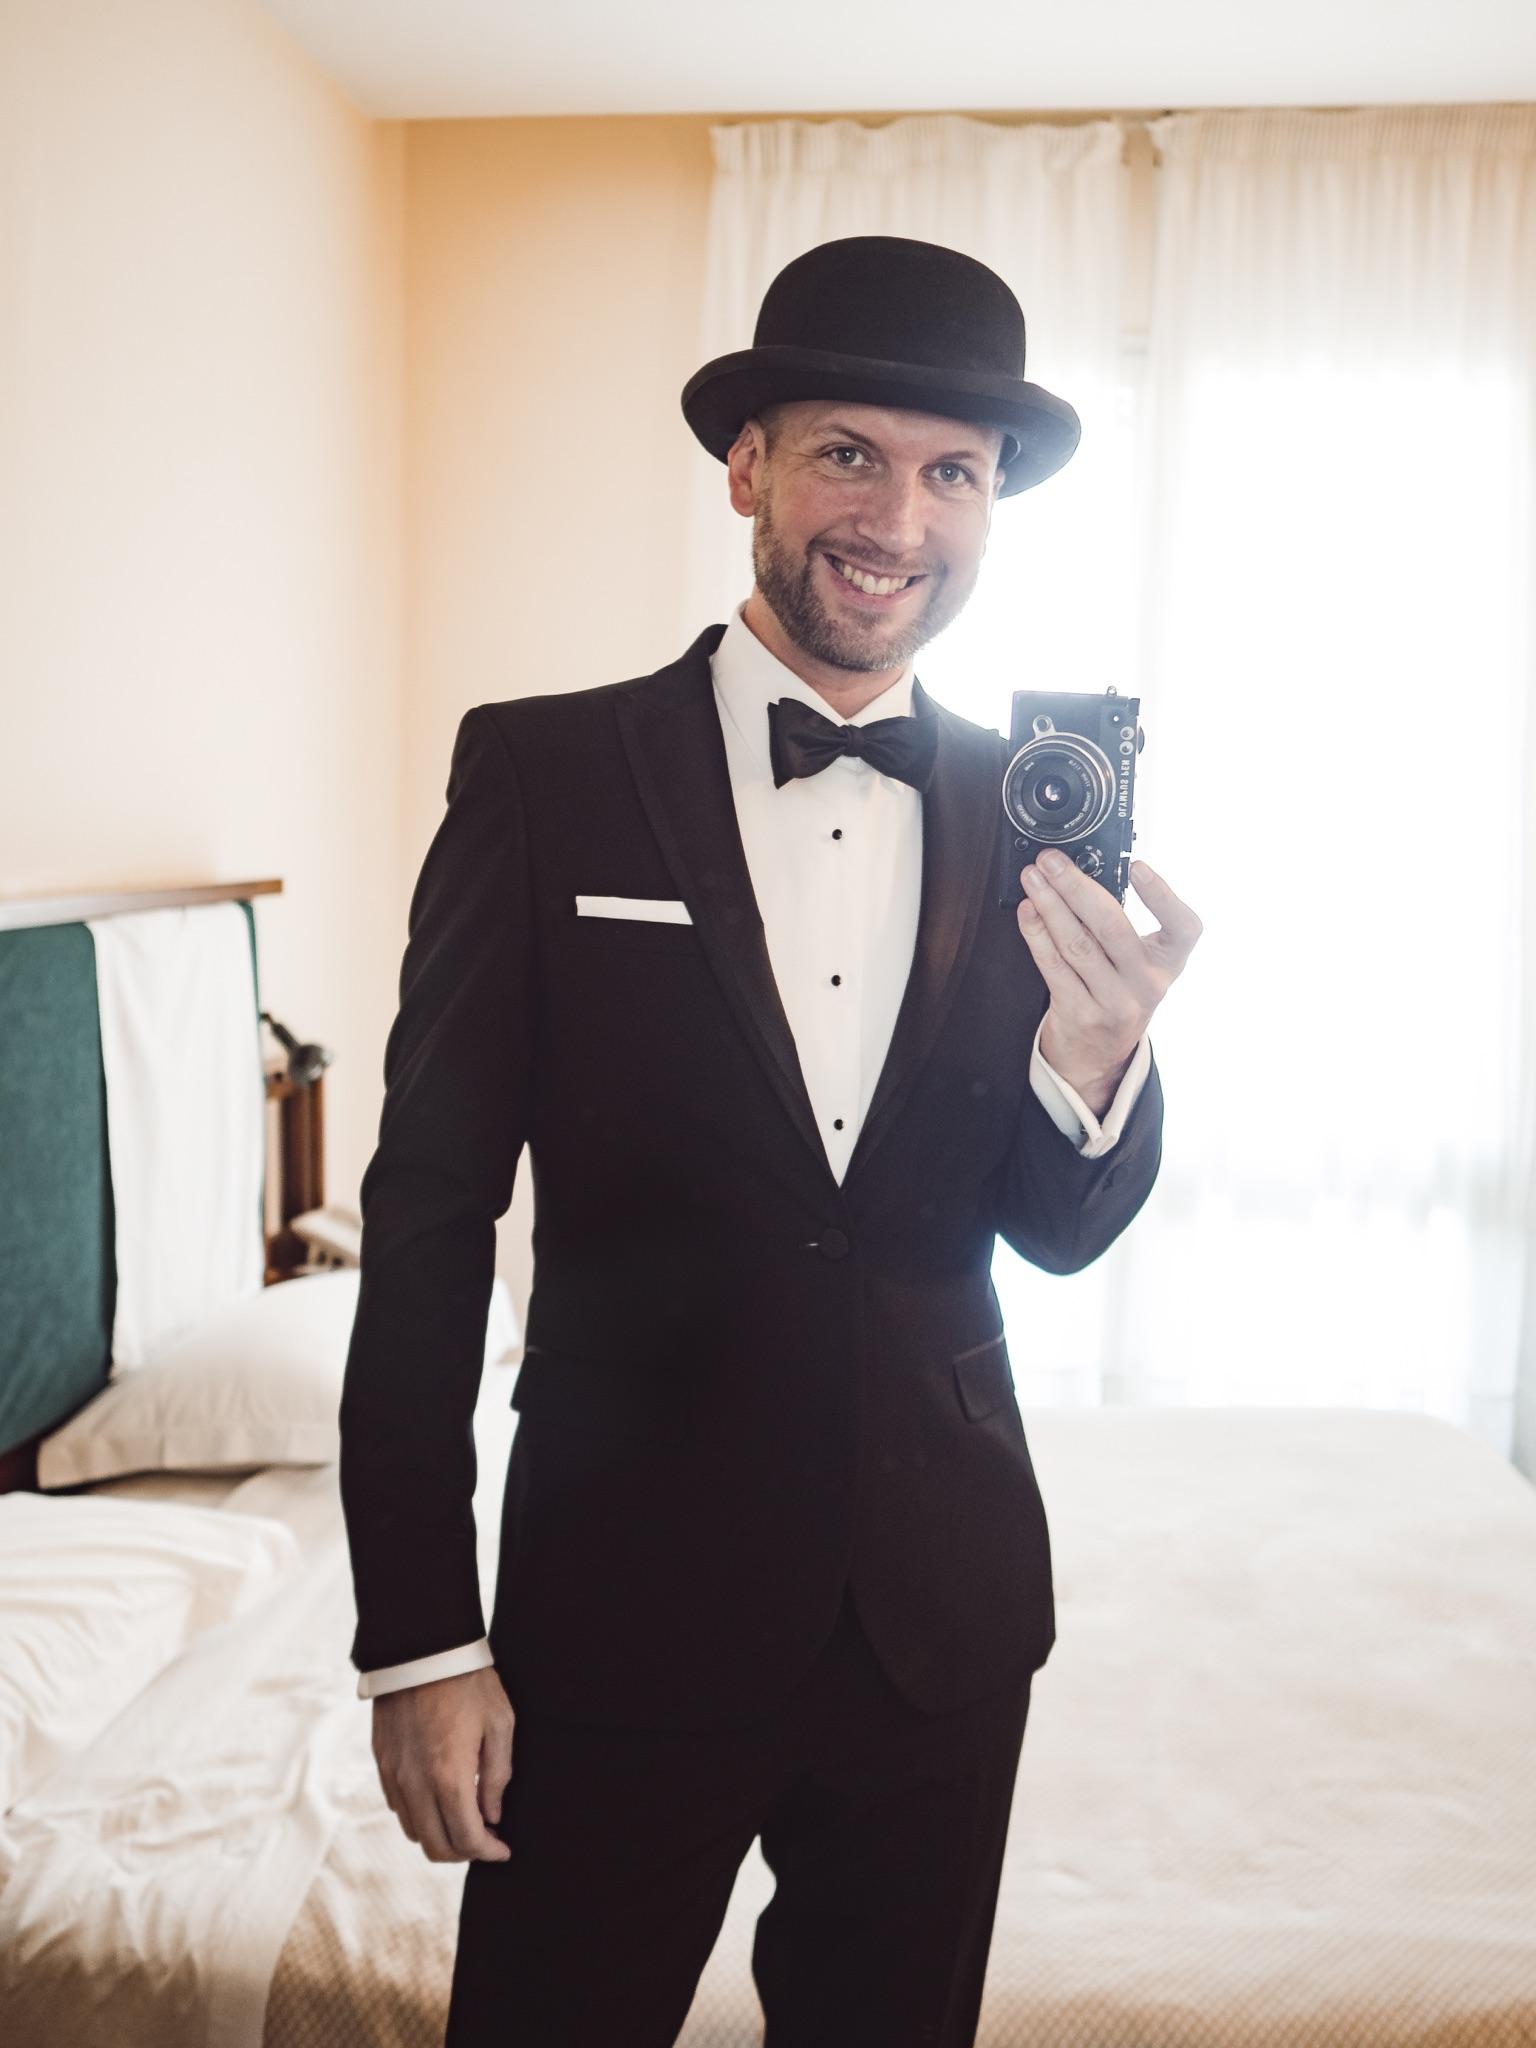 Jay McLaughlin Tuxedo Bowtie Black Tie Bowler Hat Olympus PEN-F Ravello Italy Amalfi